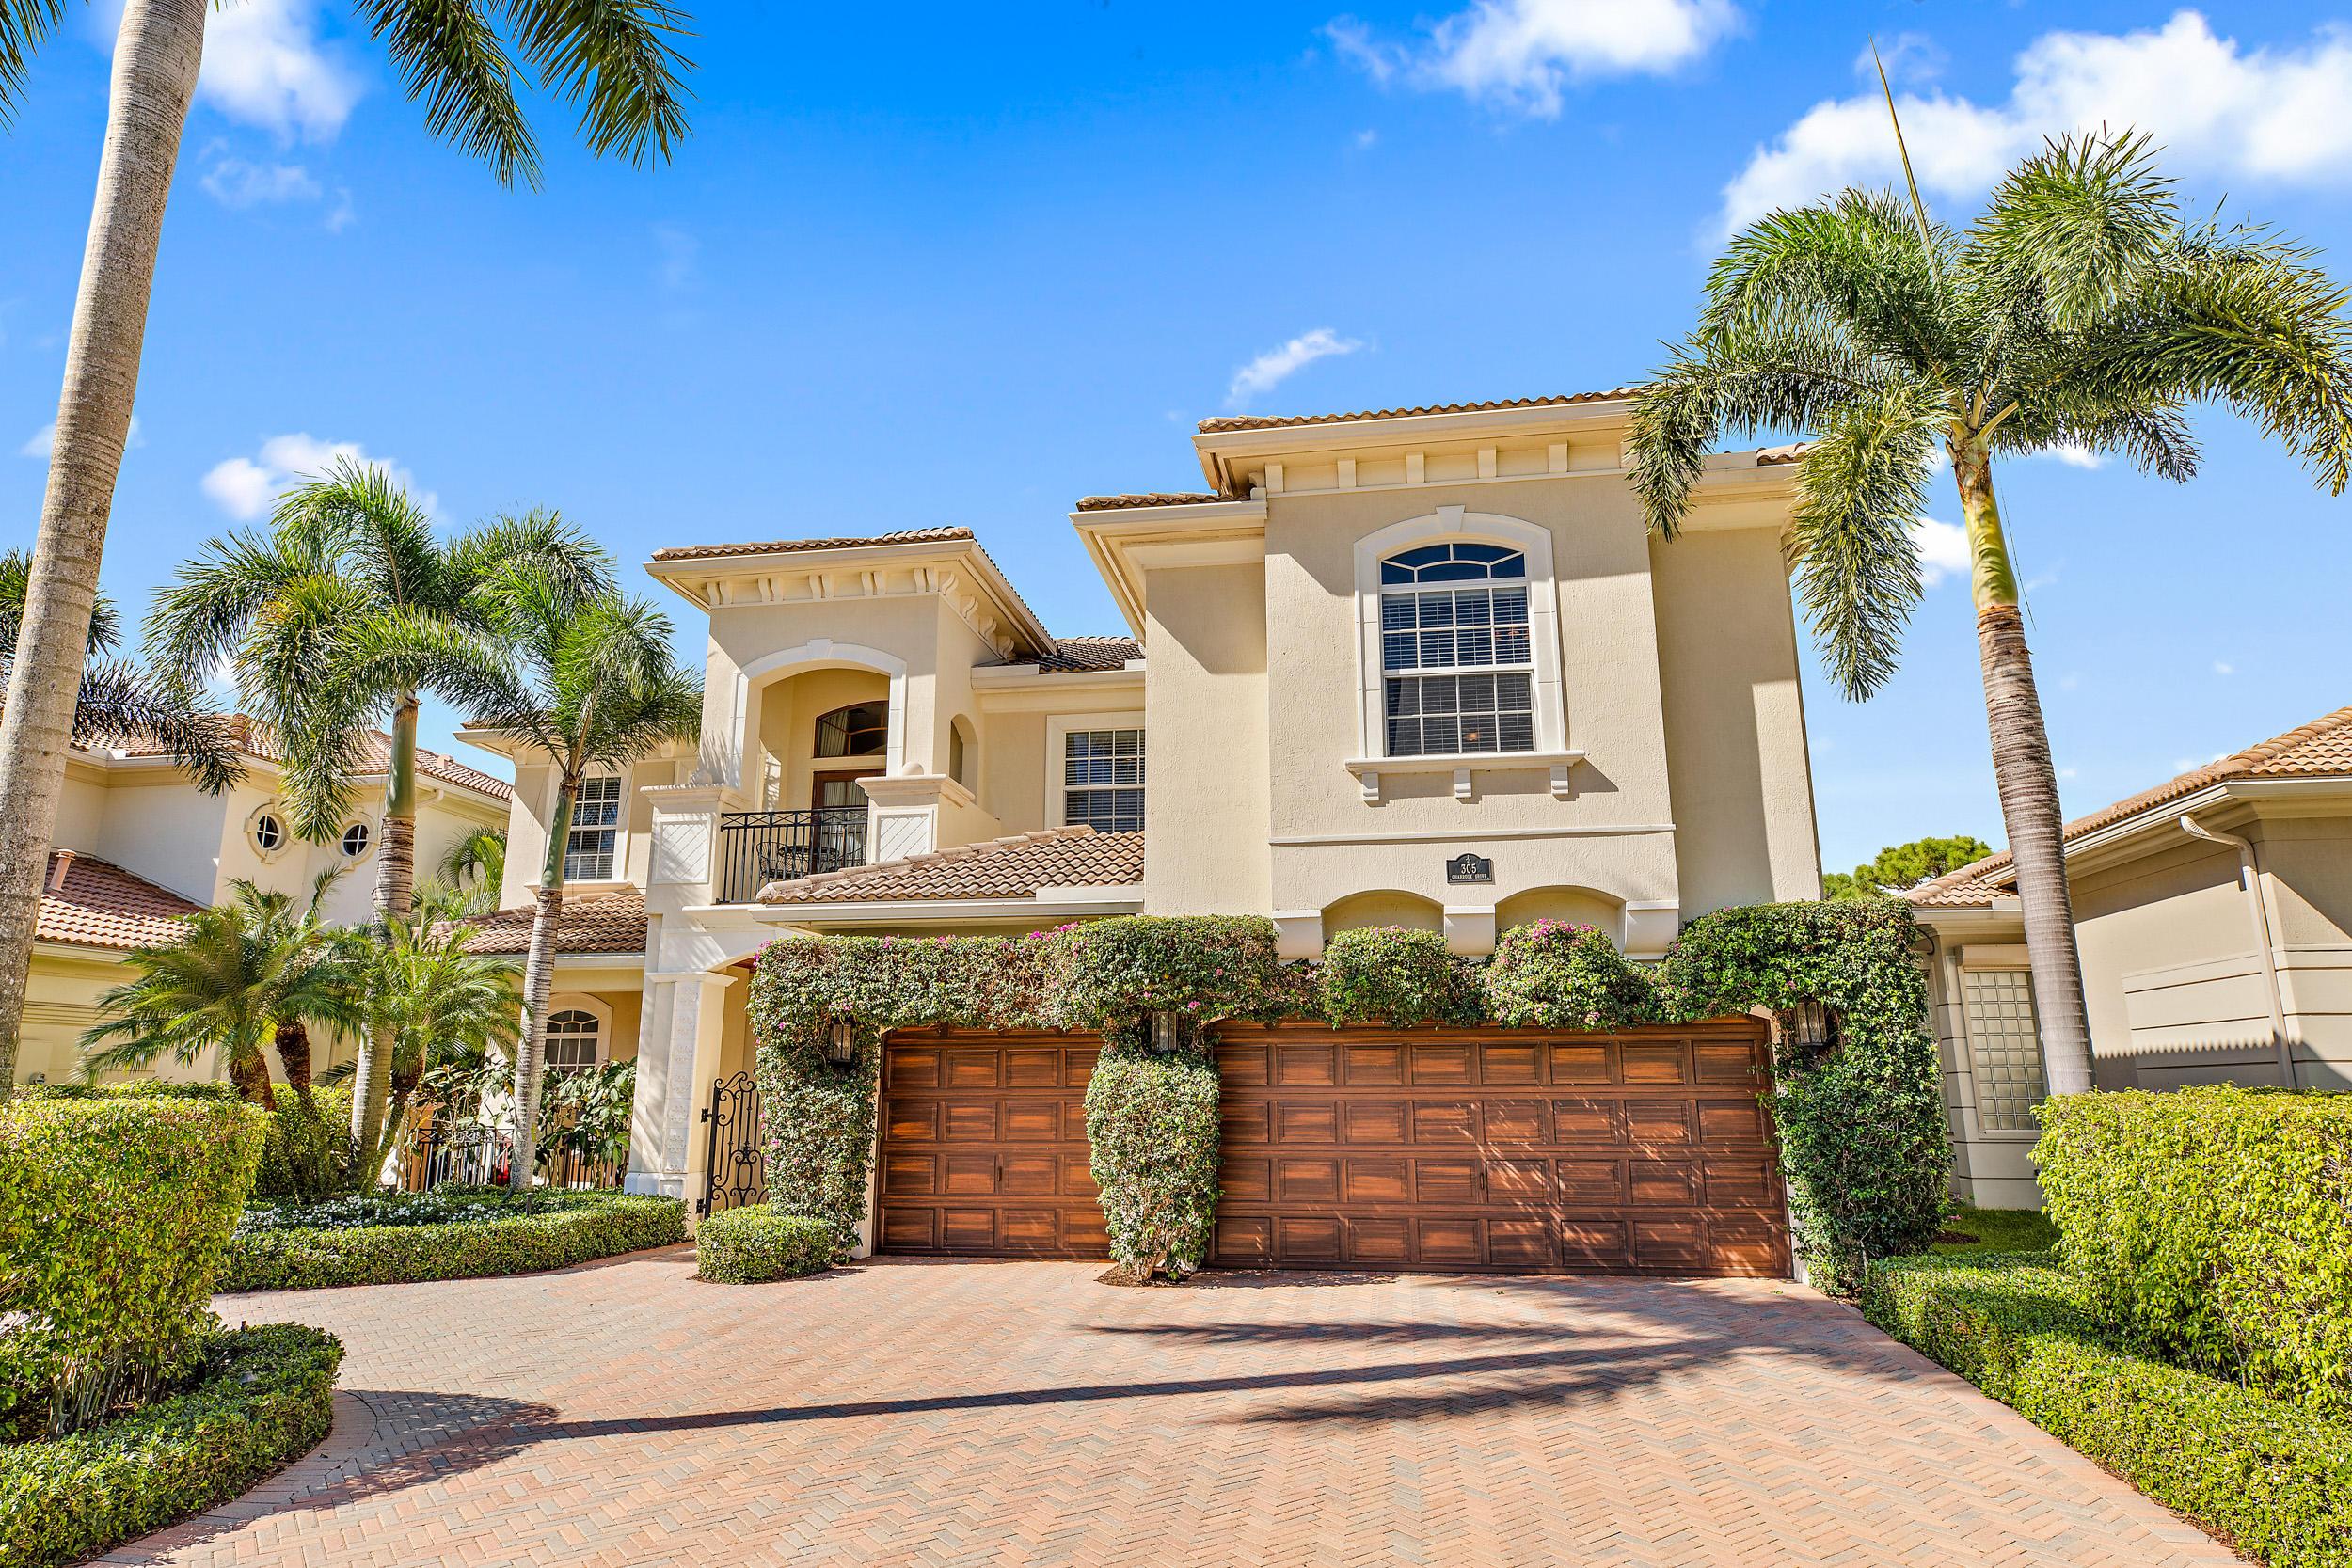 305 Charroux Drive, Palm Beach Gardens, Florida 33410, 5 Bedrooms Bedrooms, ,5.1 BathroomsBathrooms,A,Single family,Charroux,RX-10474446